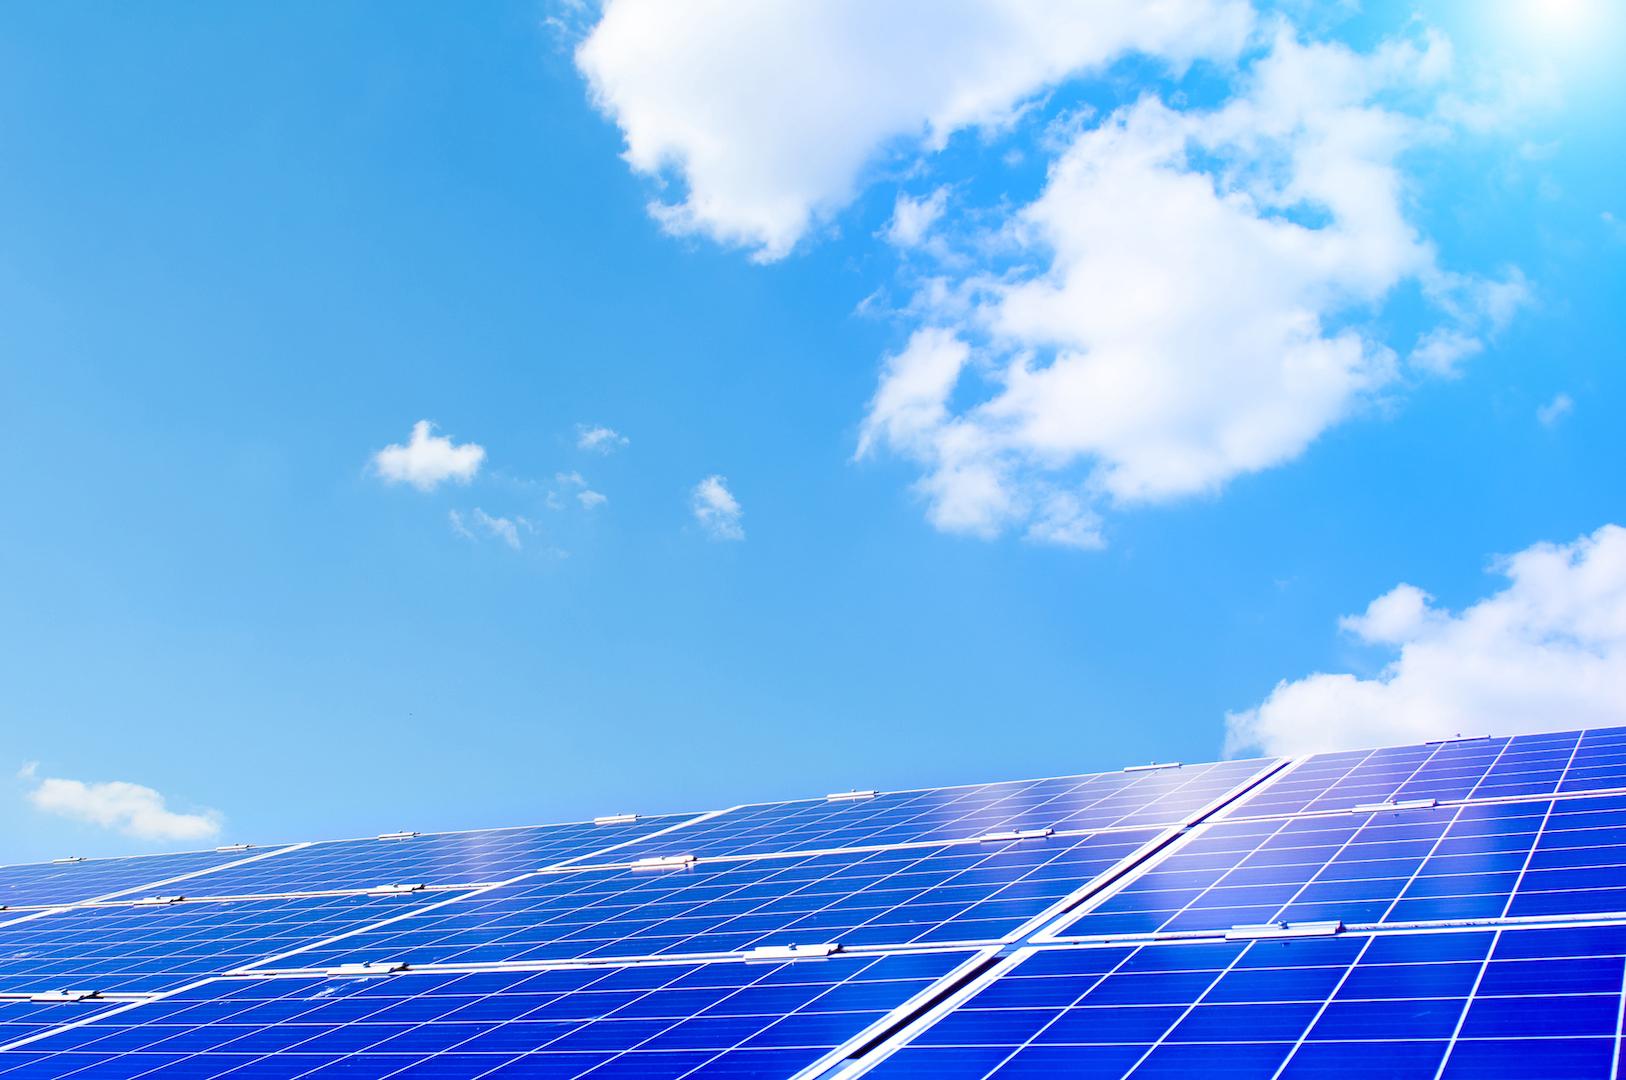 Masdar wins tender for 200 MW solar power project in Armenia